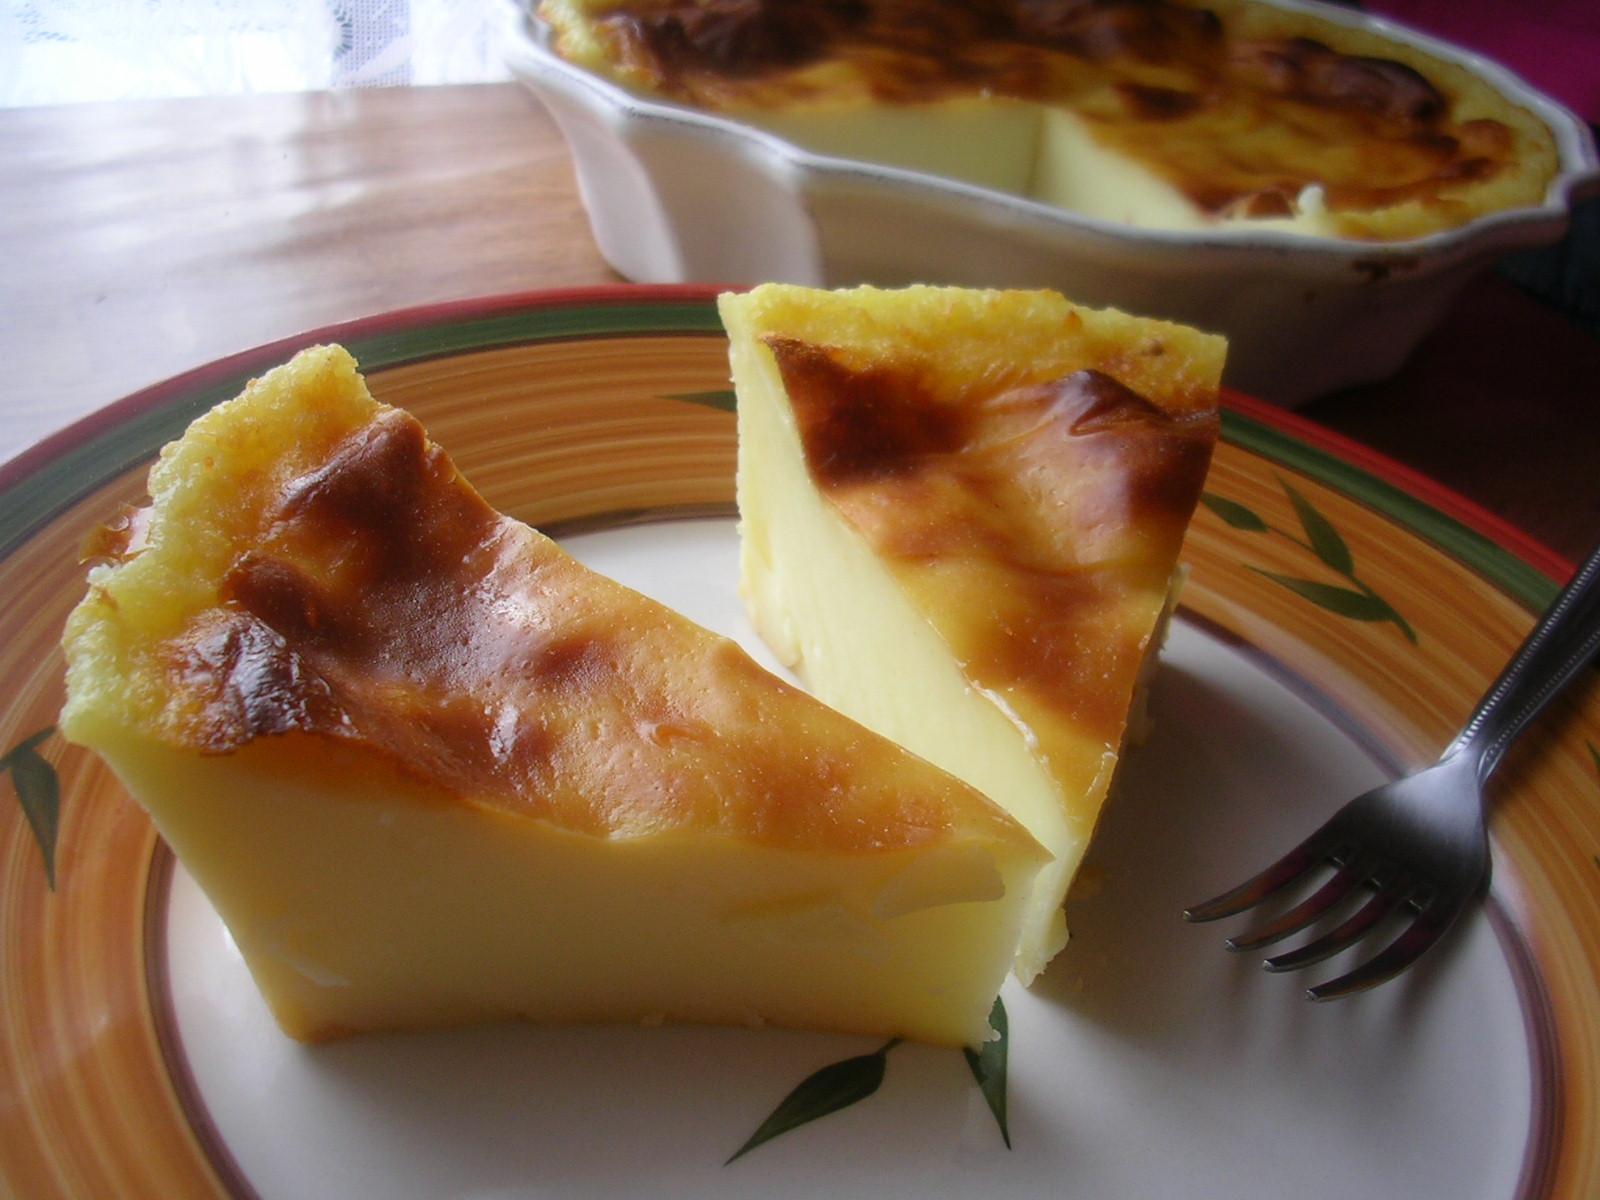 Halawiyat samira recettes de cuisine algrienne holidays oo for Cuisine algerienne